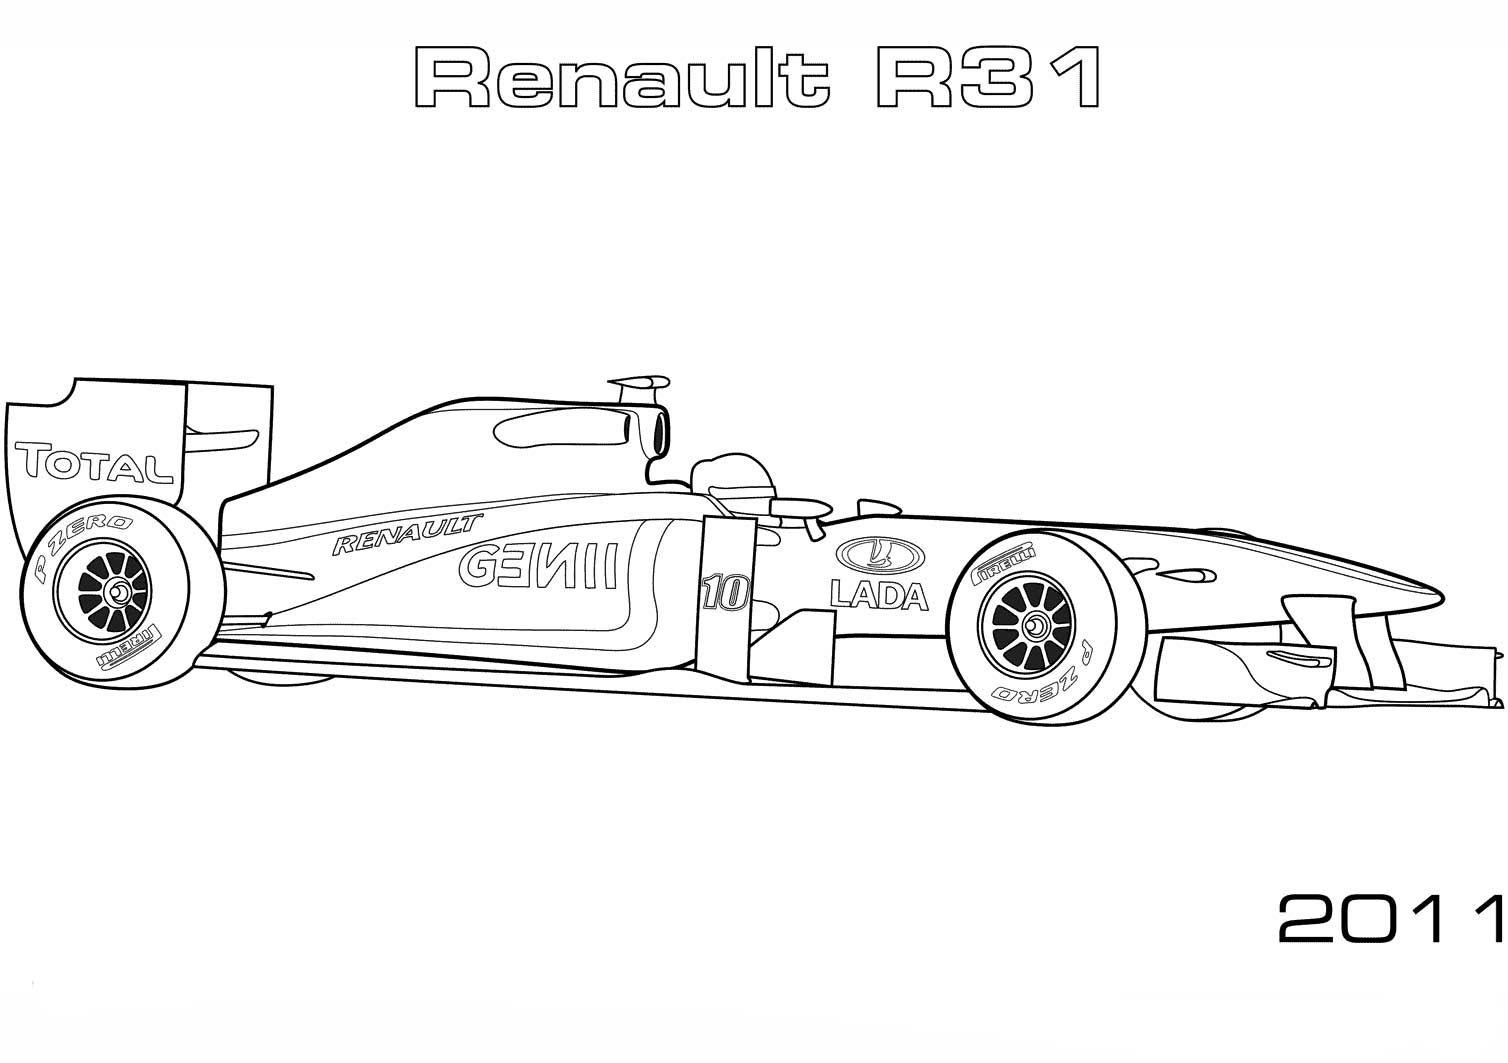 Renault R31 Formula 1 Car Coloring Page Cars Coloring Pages Coloring Pages Sports Coloring Pages